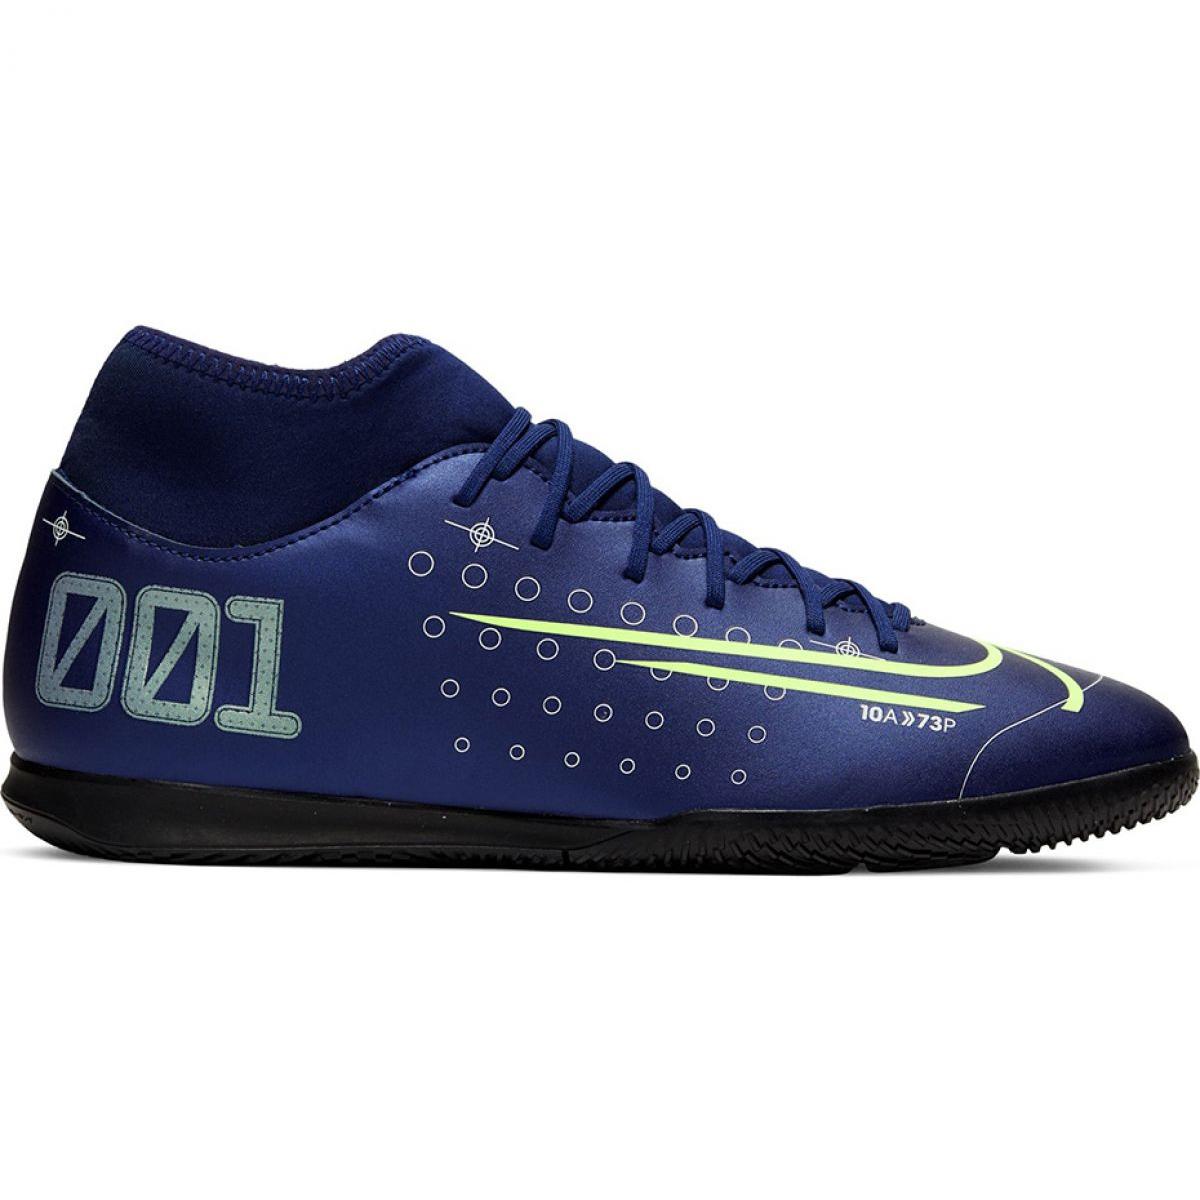 Chuteira Nike Infantil Mercurial Superfly 7 Club ic Preta Virtual Esportes